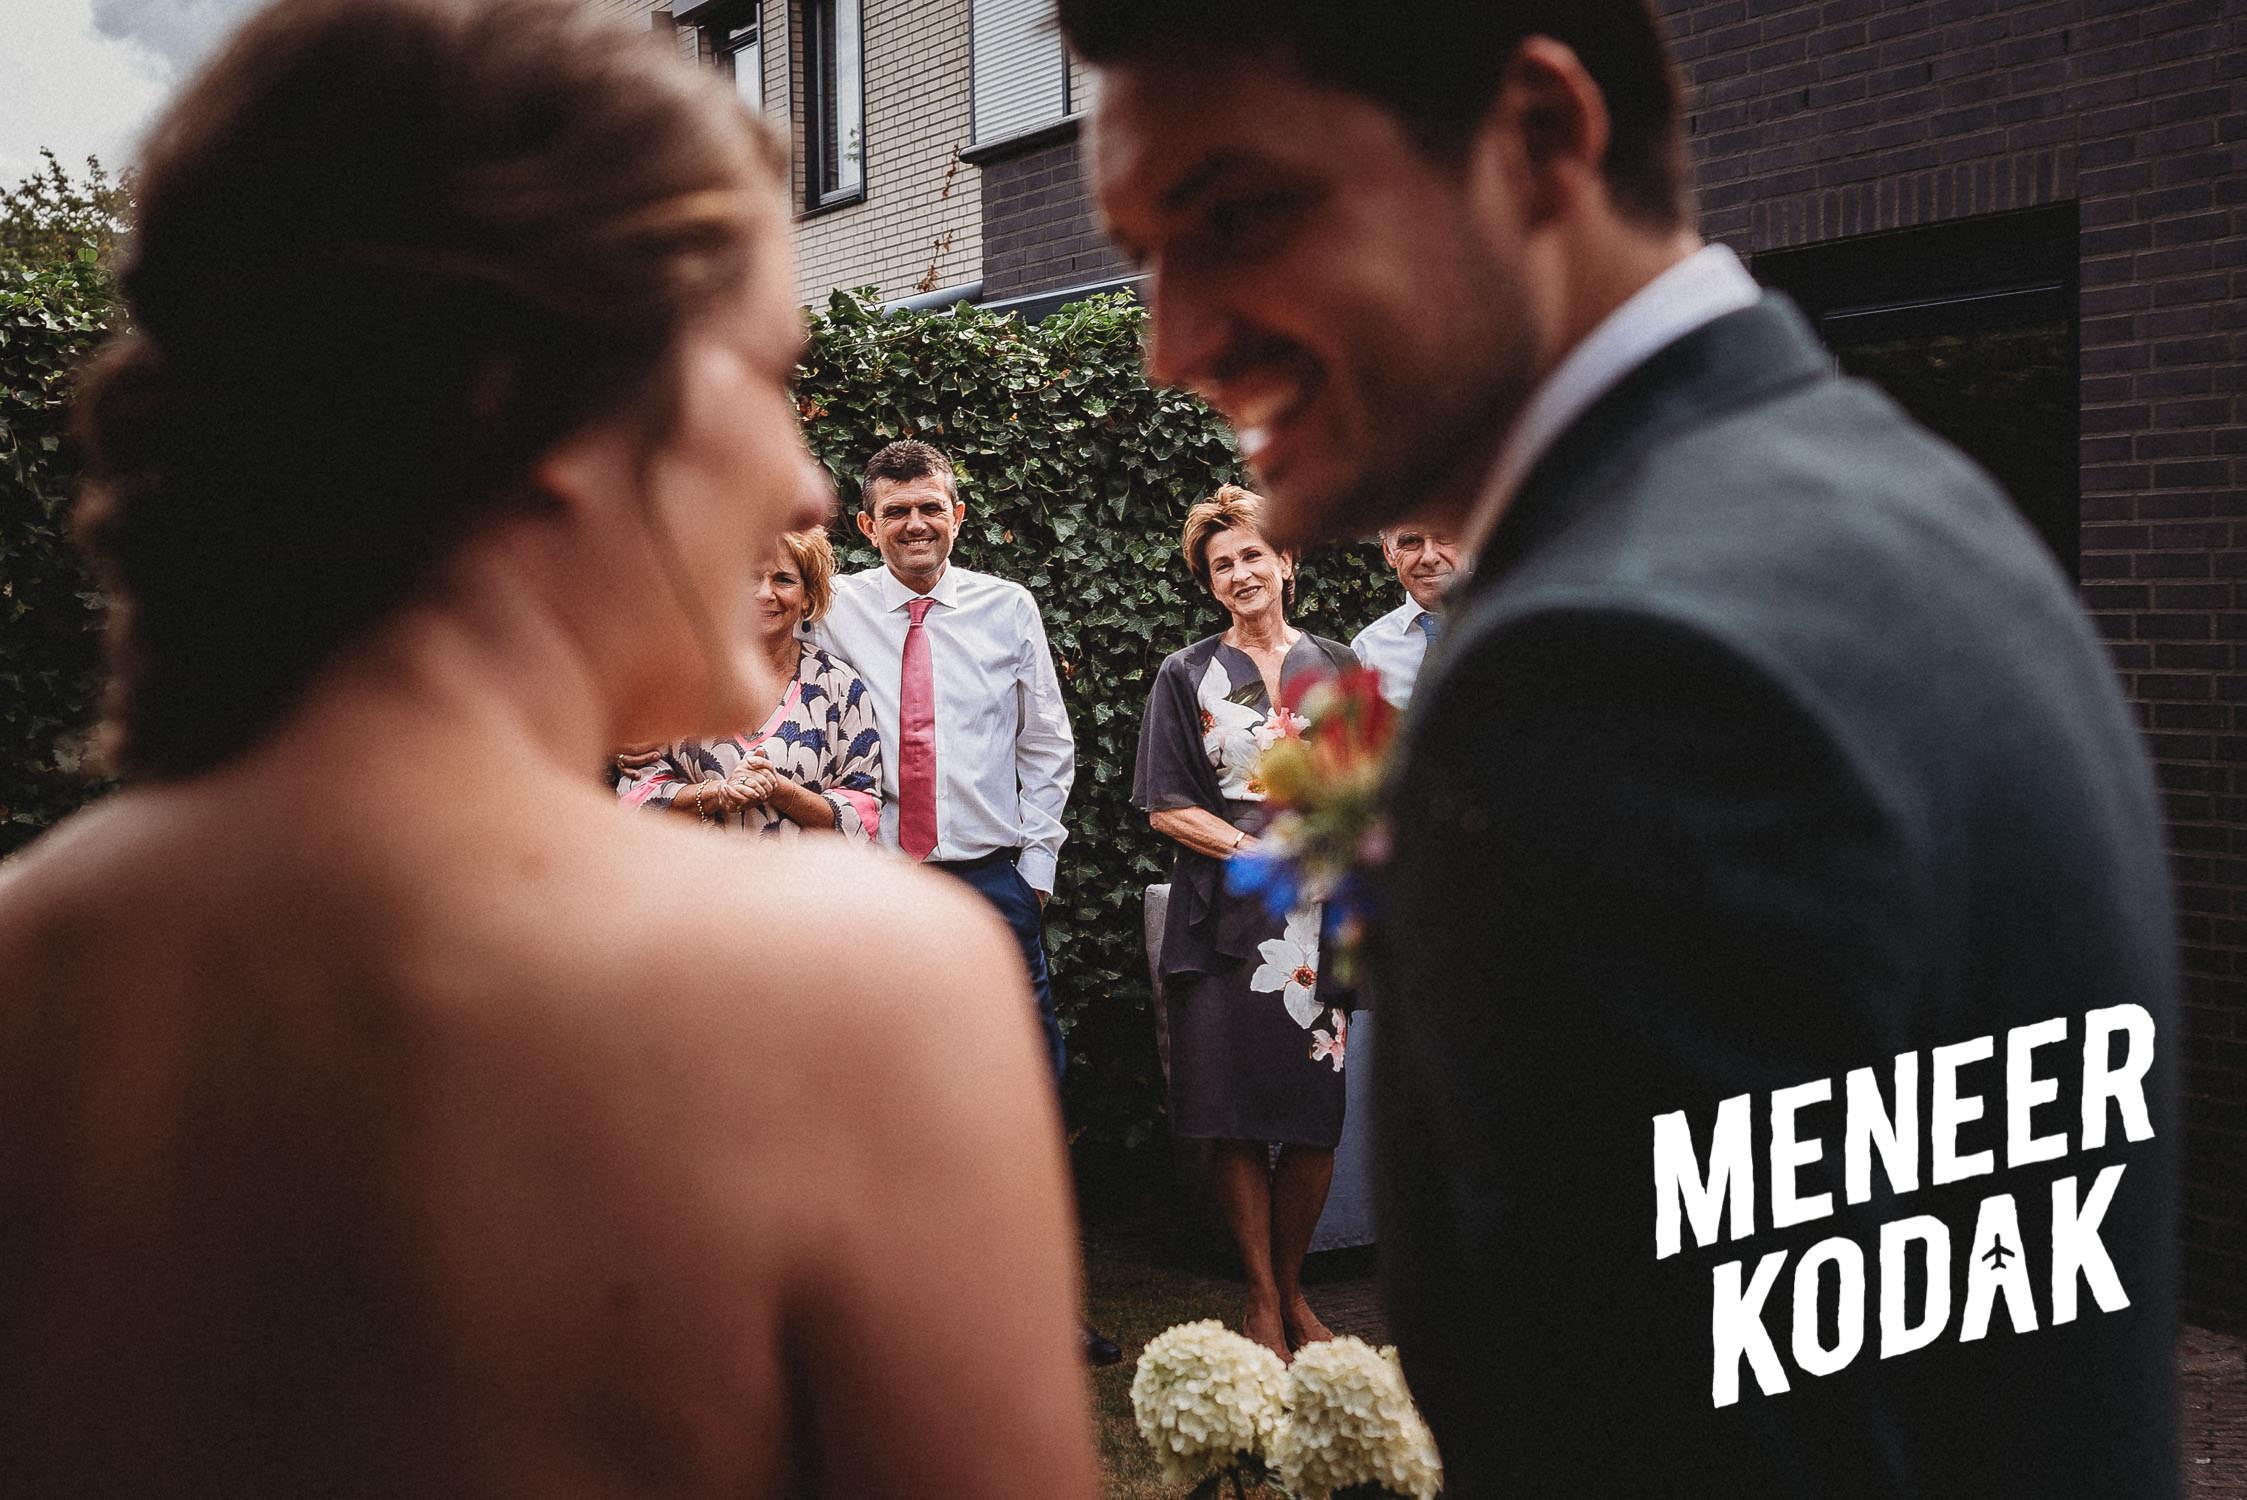 Meneer Kodak - Trouwreportage - Breda - E&M-072.jpg